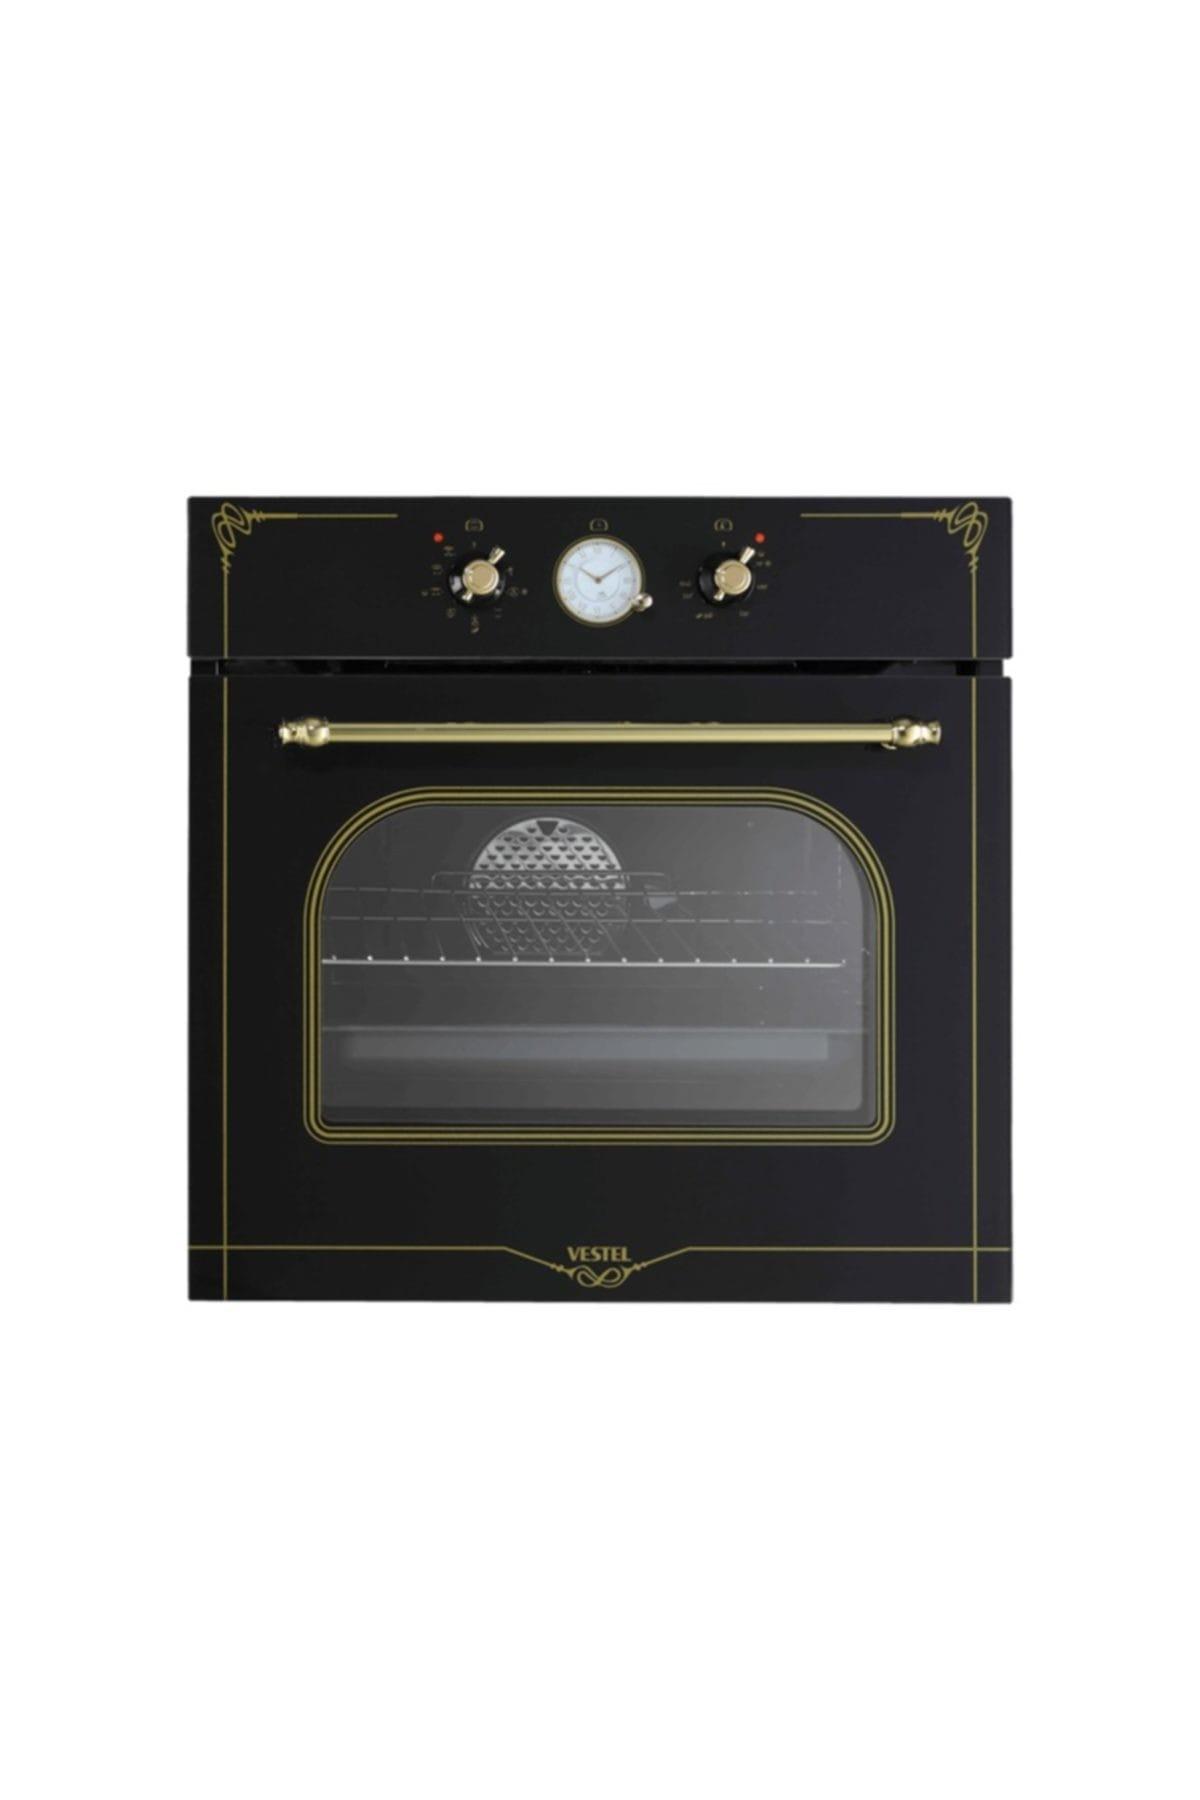 AFRB-7688 Rustik Siyah Ankastre Fırın